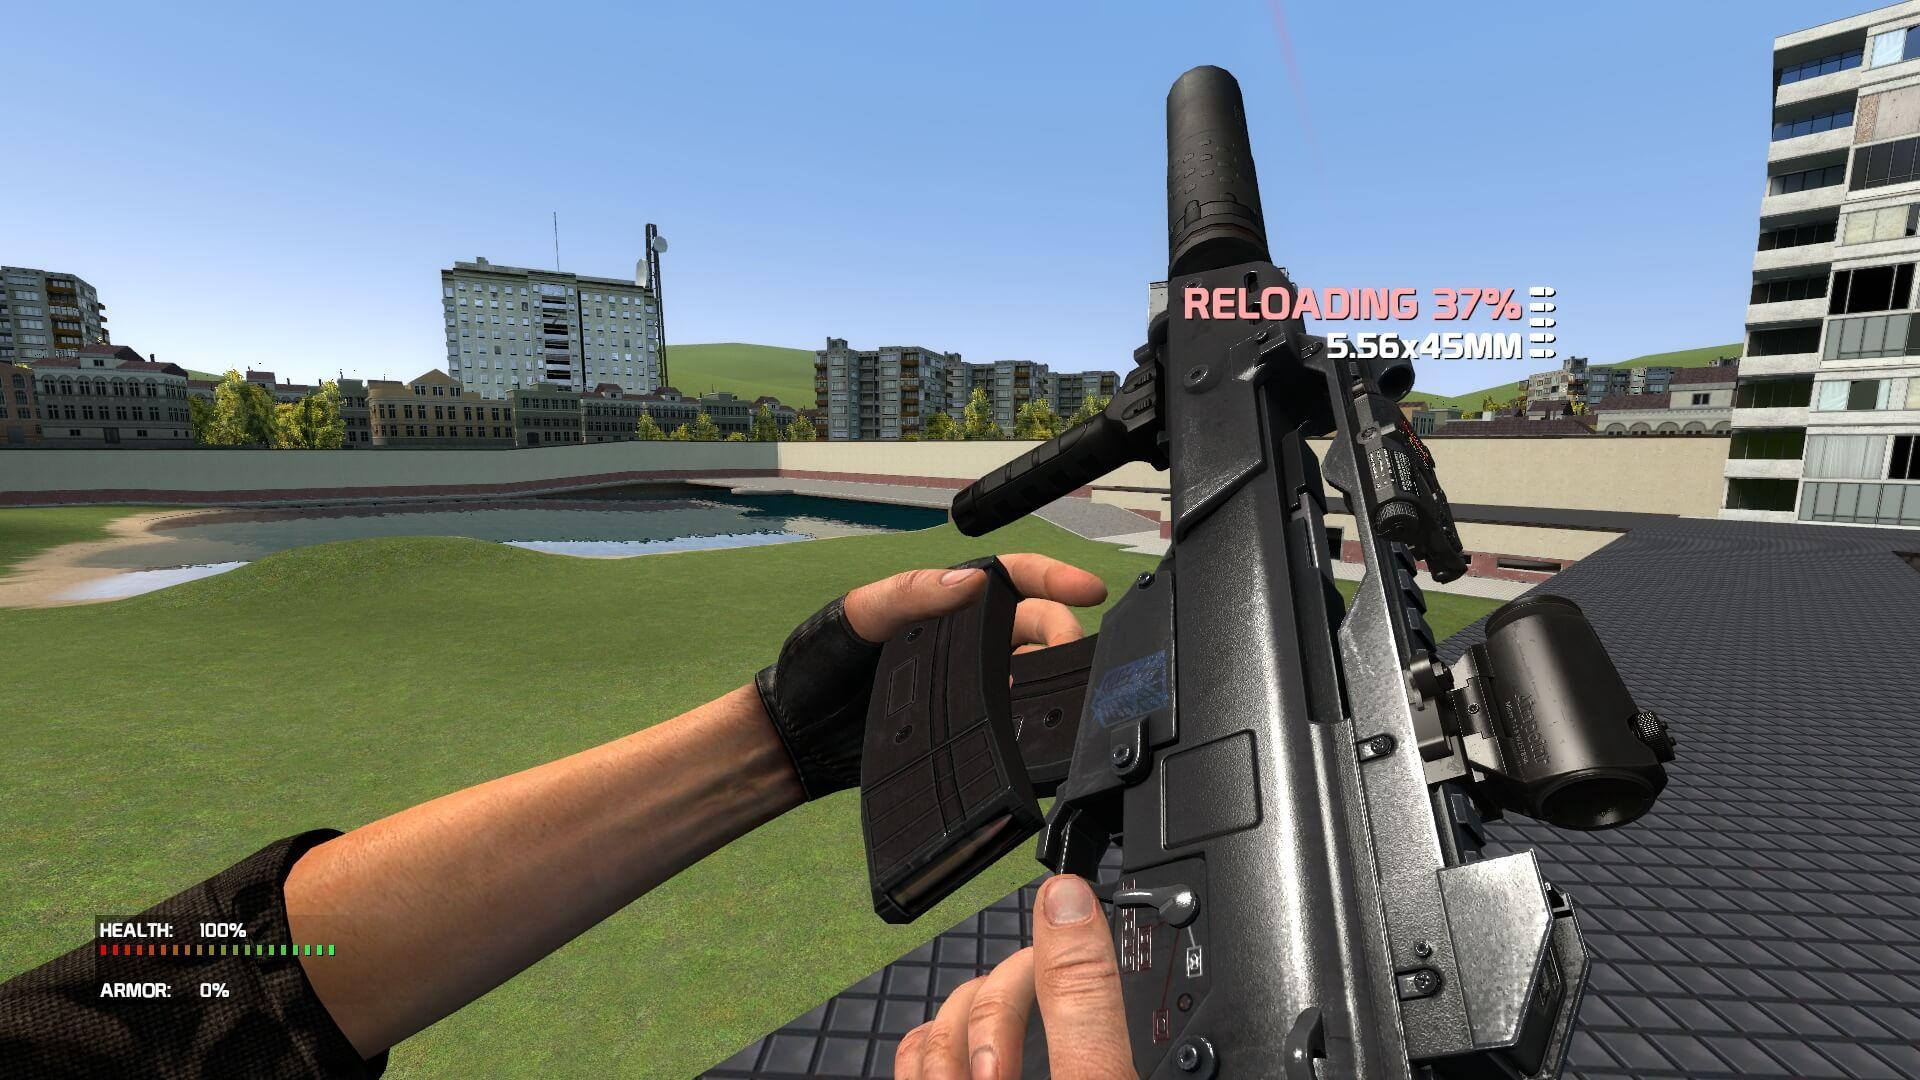 Garry's Mod 13 - Extra Customizable Weaponry 2.0 - больше оружия для CW!